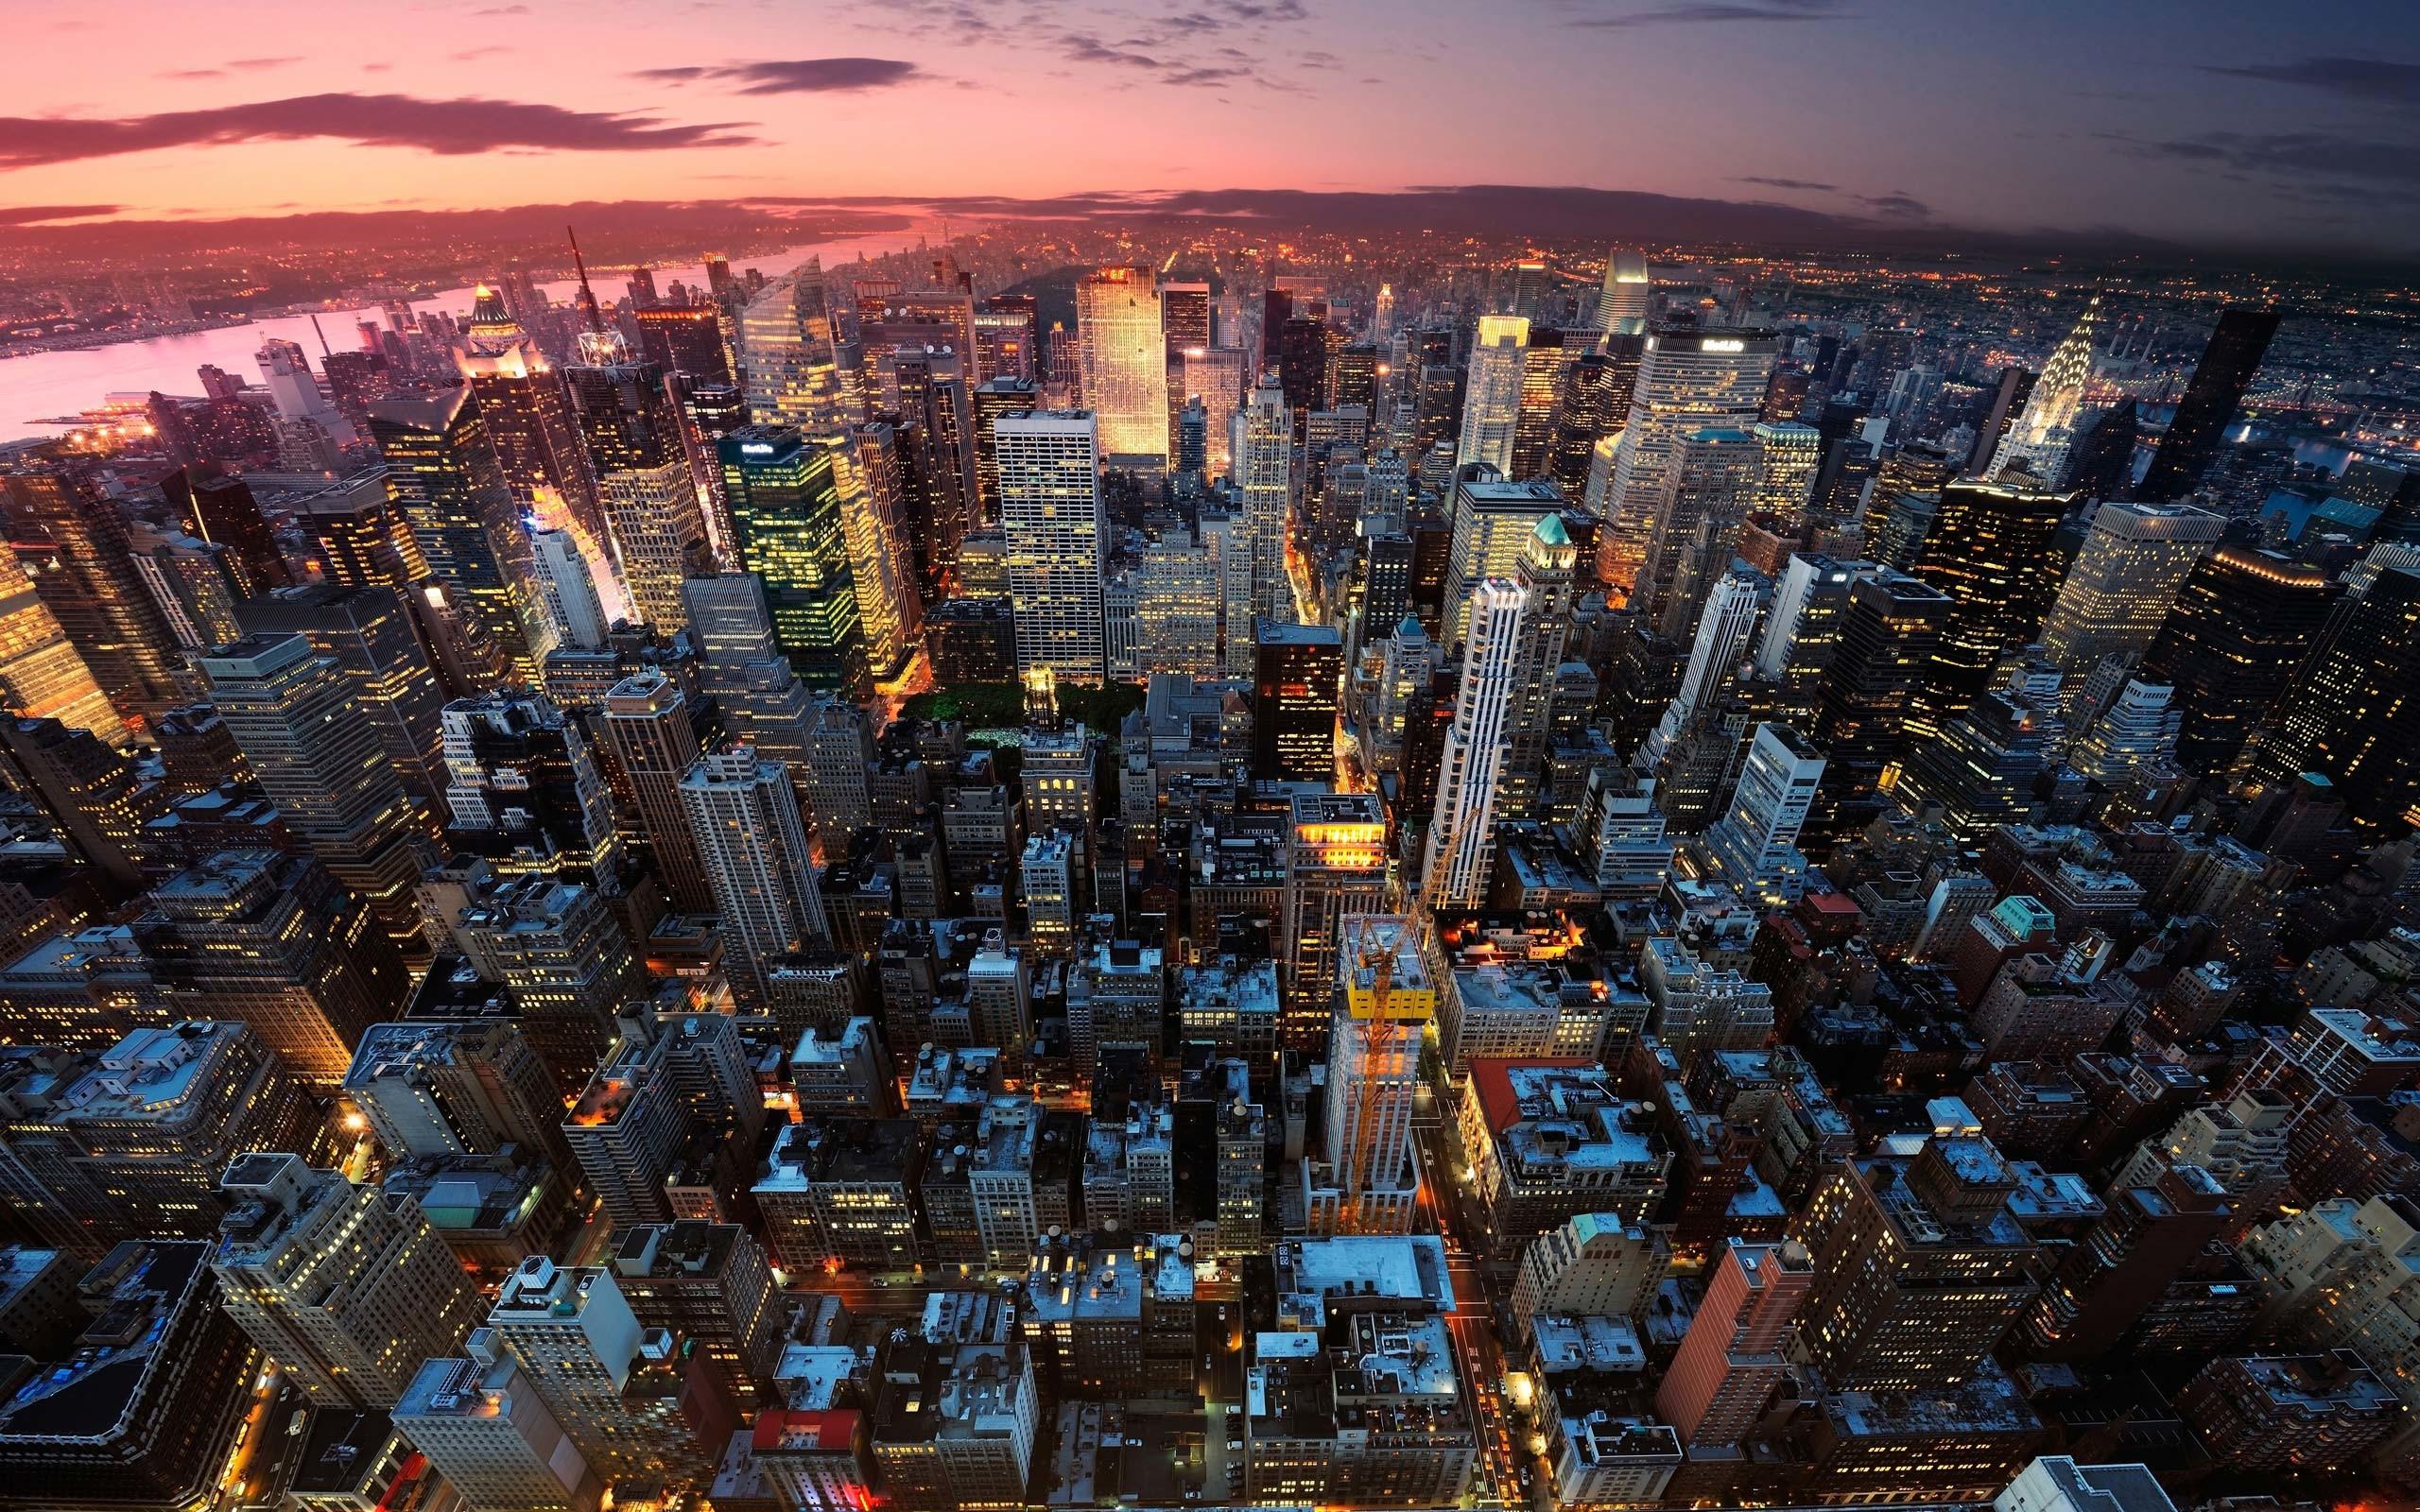 New York Wallpaper 4K | Free Desktop Backgrounds